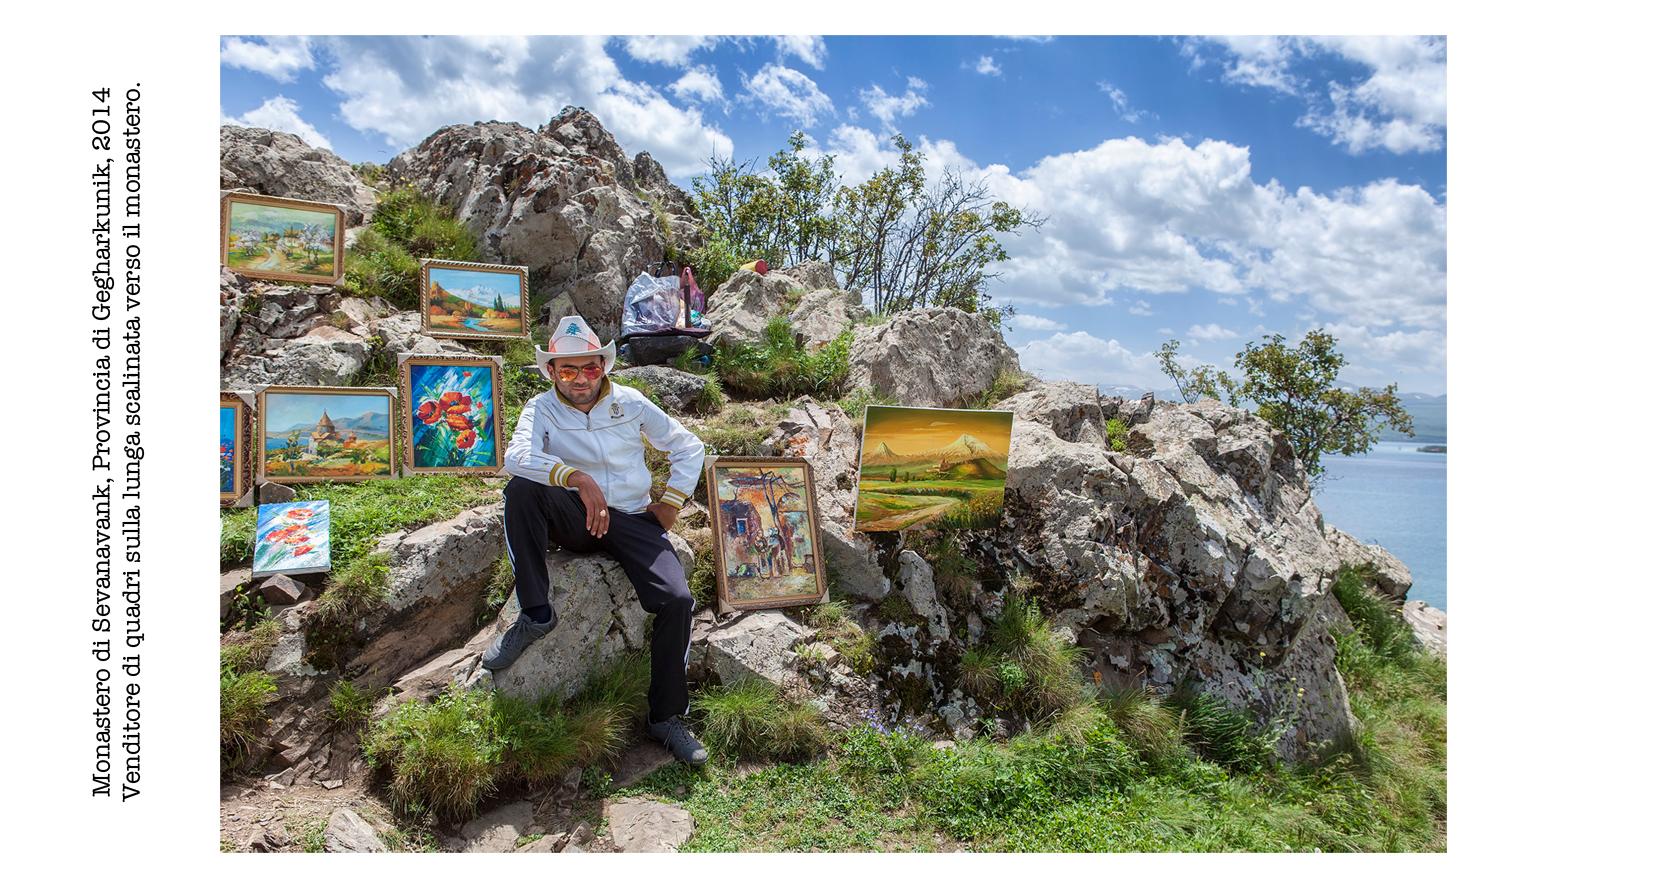 Viaggio-in-Armenia-09.jpg